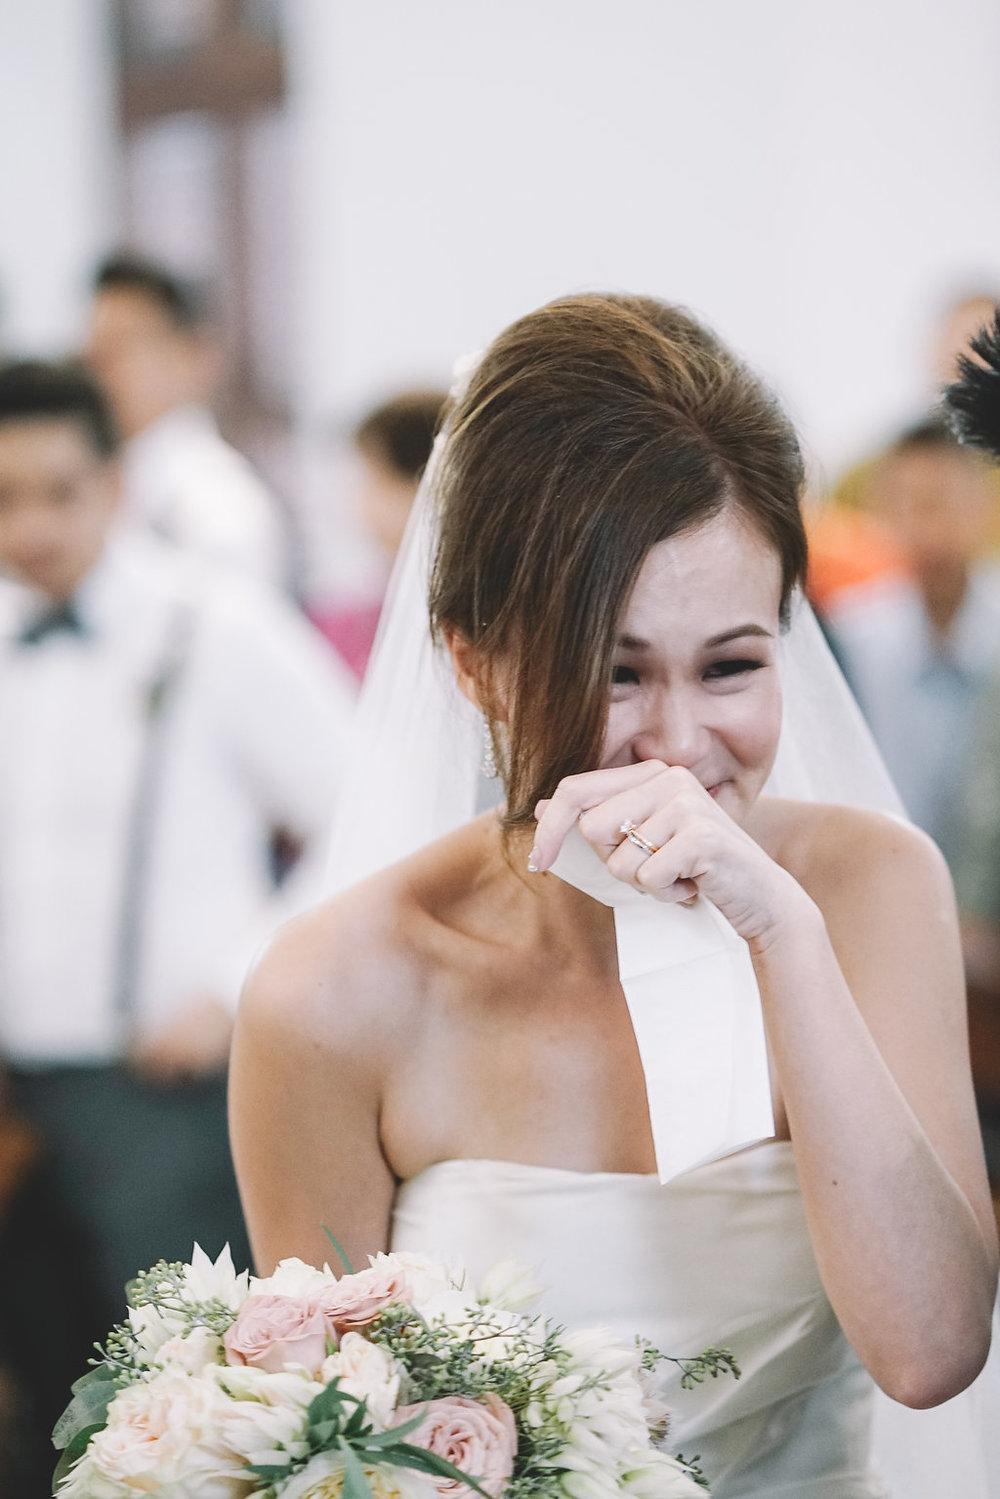 Singapore Wedding Photography The White Rabbit-78.jpg